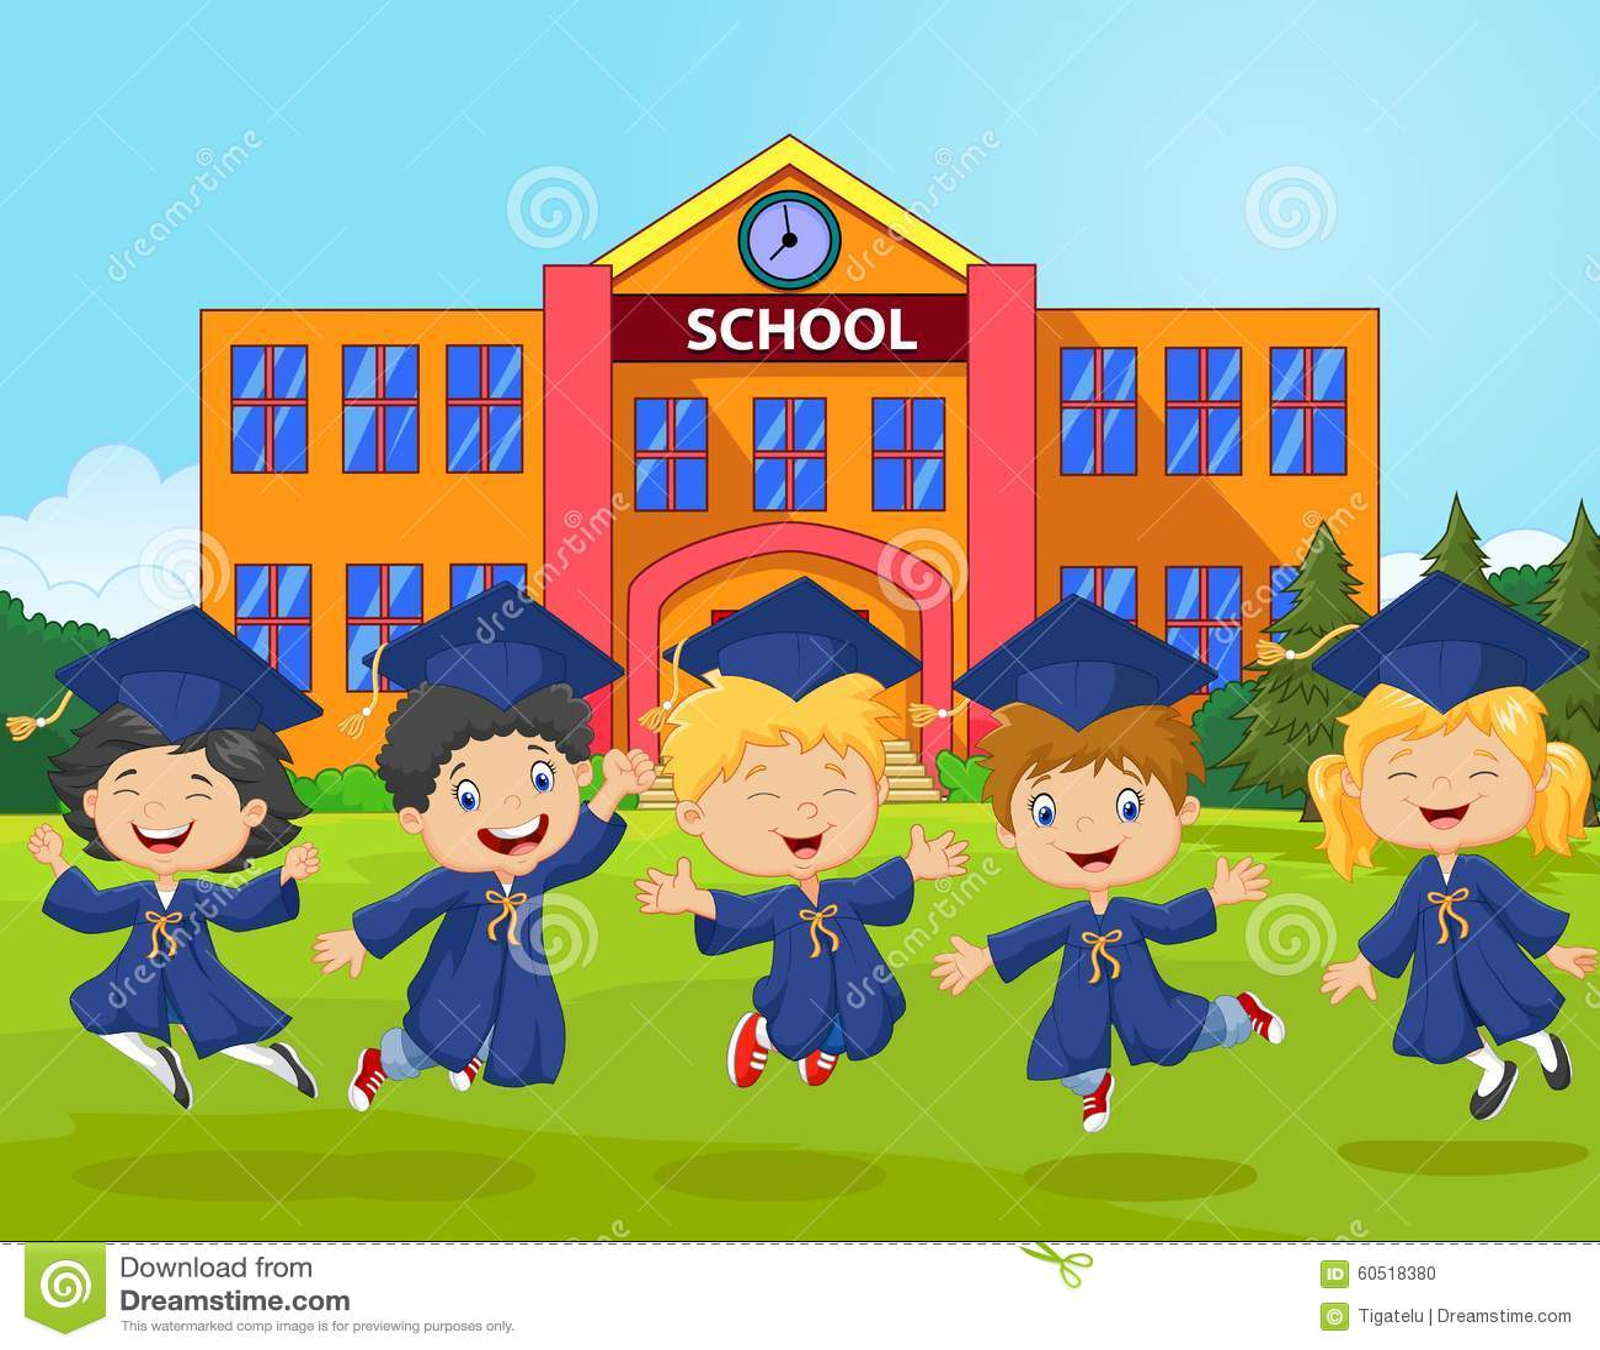 cartoon little kids celebrate their graduation on school